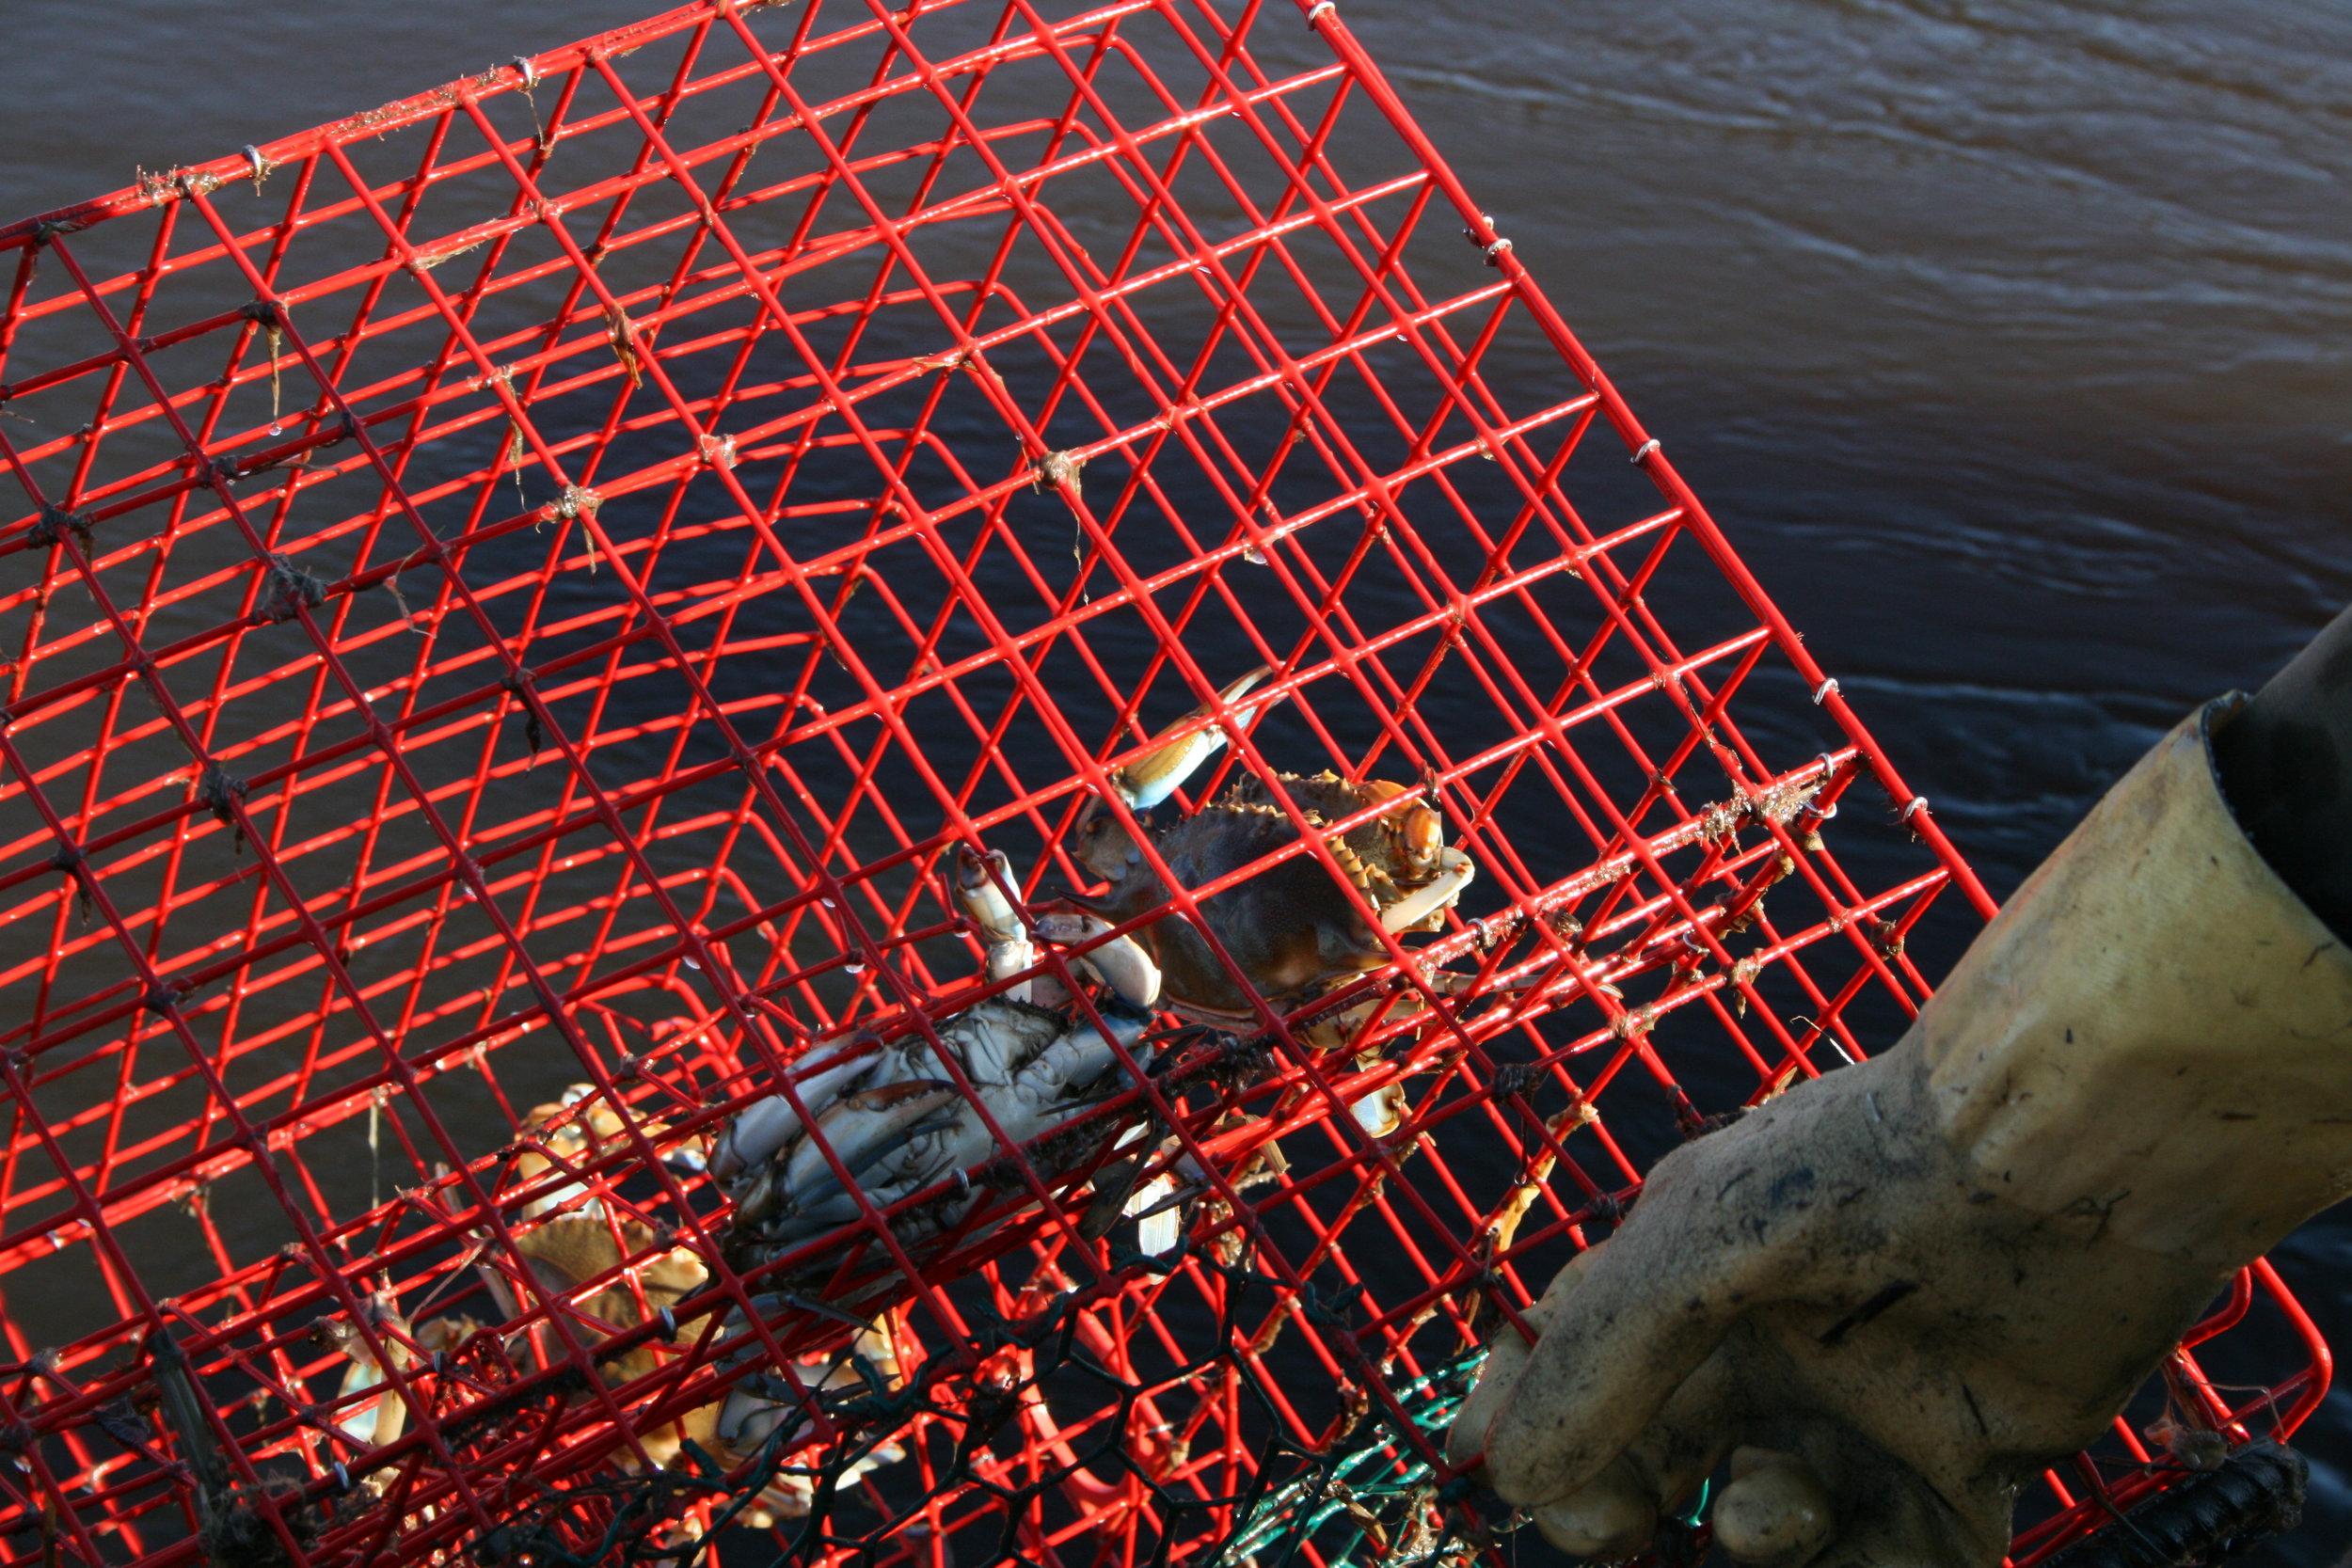 House_hauls_in_crab_trap..JPG